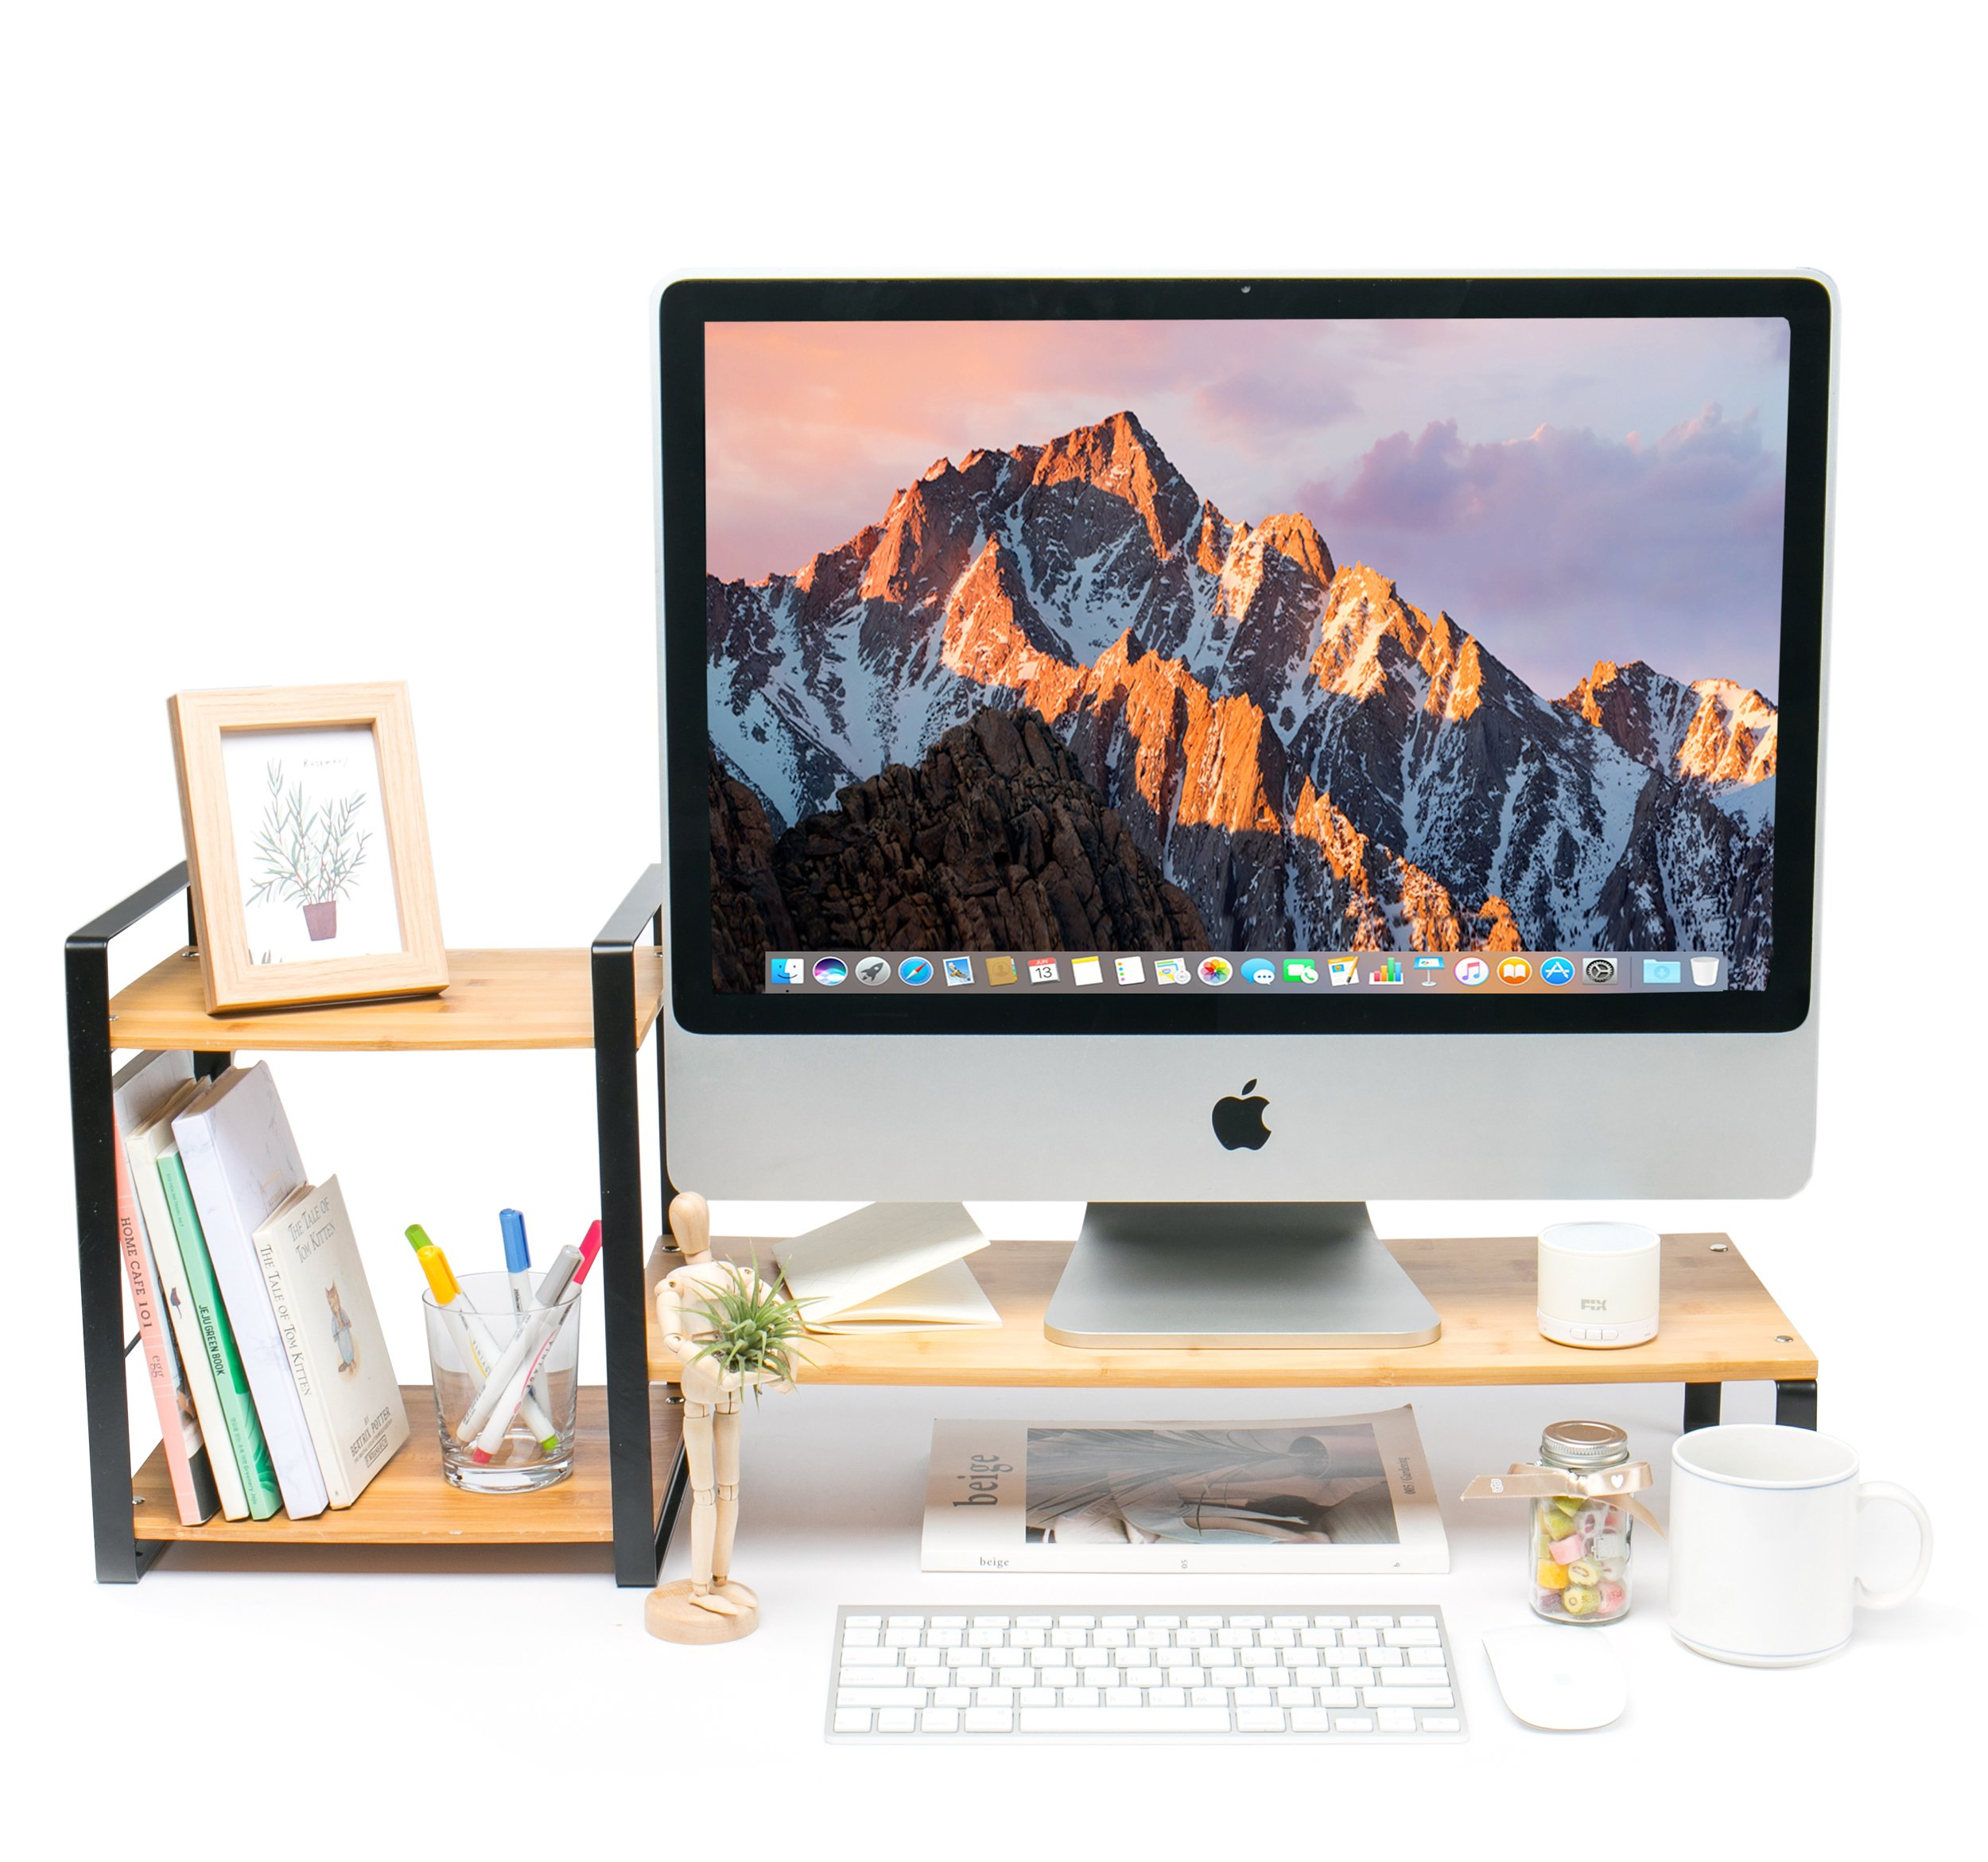 JackCubeDesign Bamboo Monitor Stand Computer Riser 2-Tier Desktop Bookshelf Countertop Bookcase,Book Storage Organizer Display Shelf Rack Home Office– :MK363A